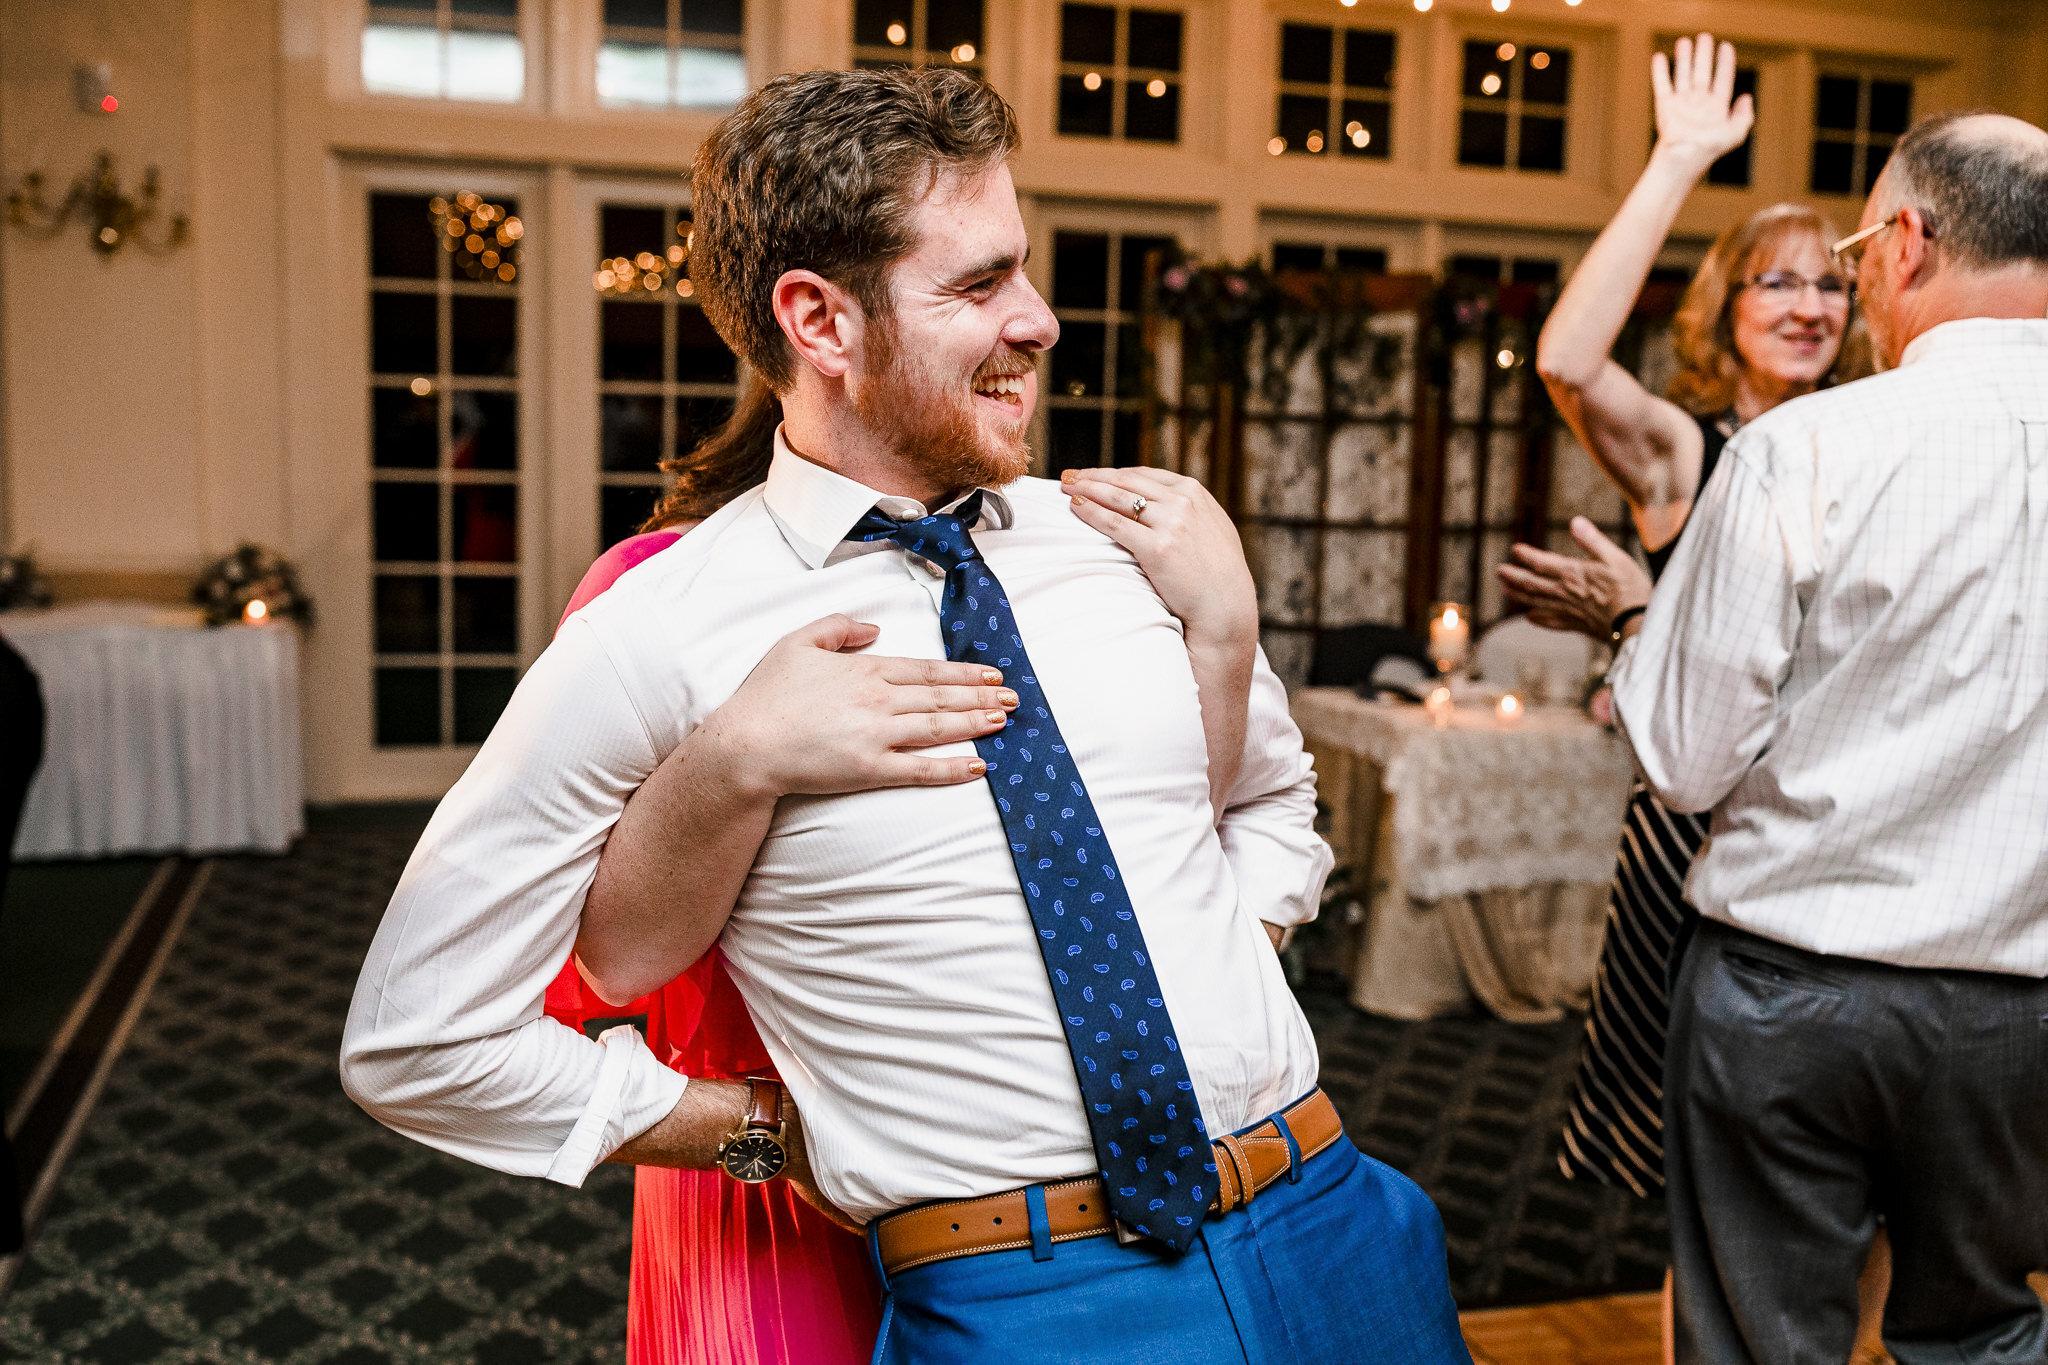 Coyle-Forsgate-Country-Club-Wedding-Photographer-52.JPG